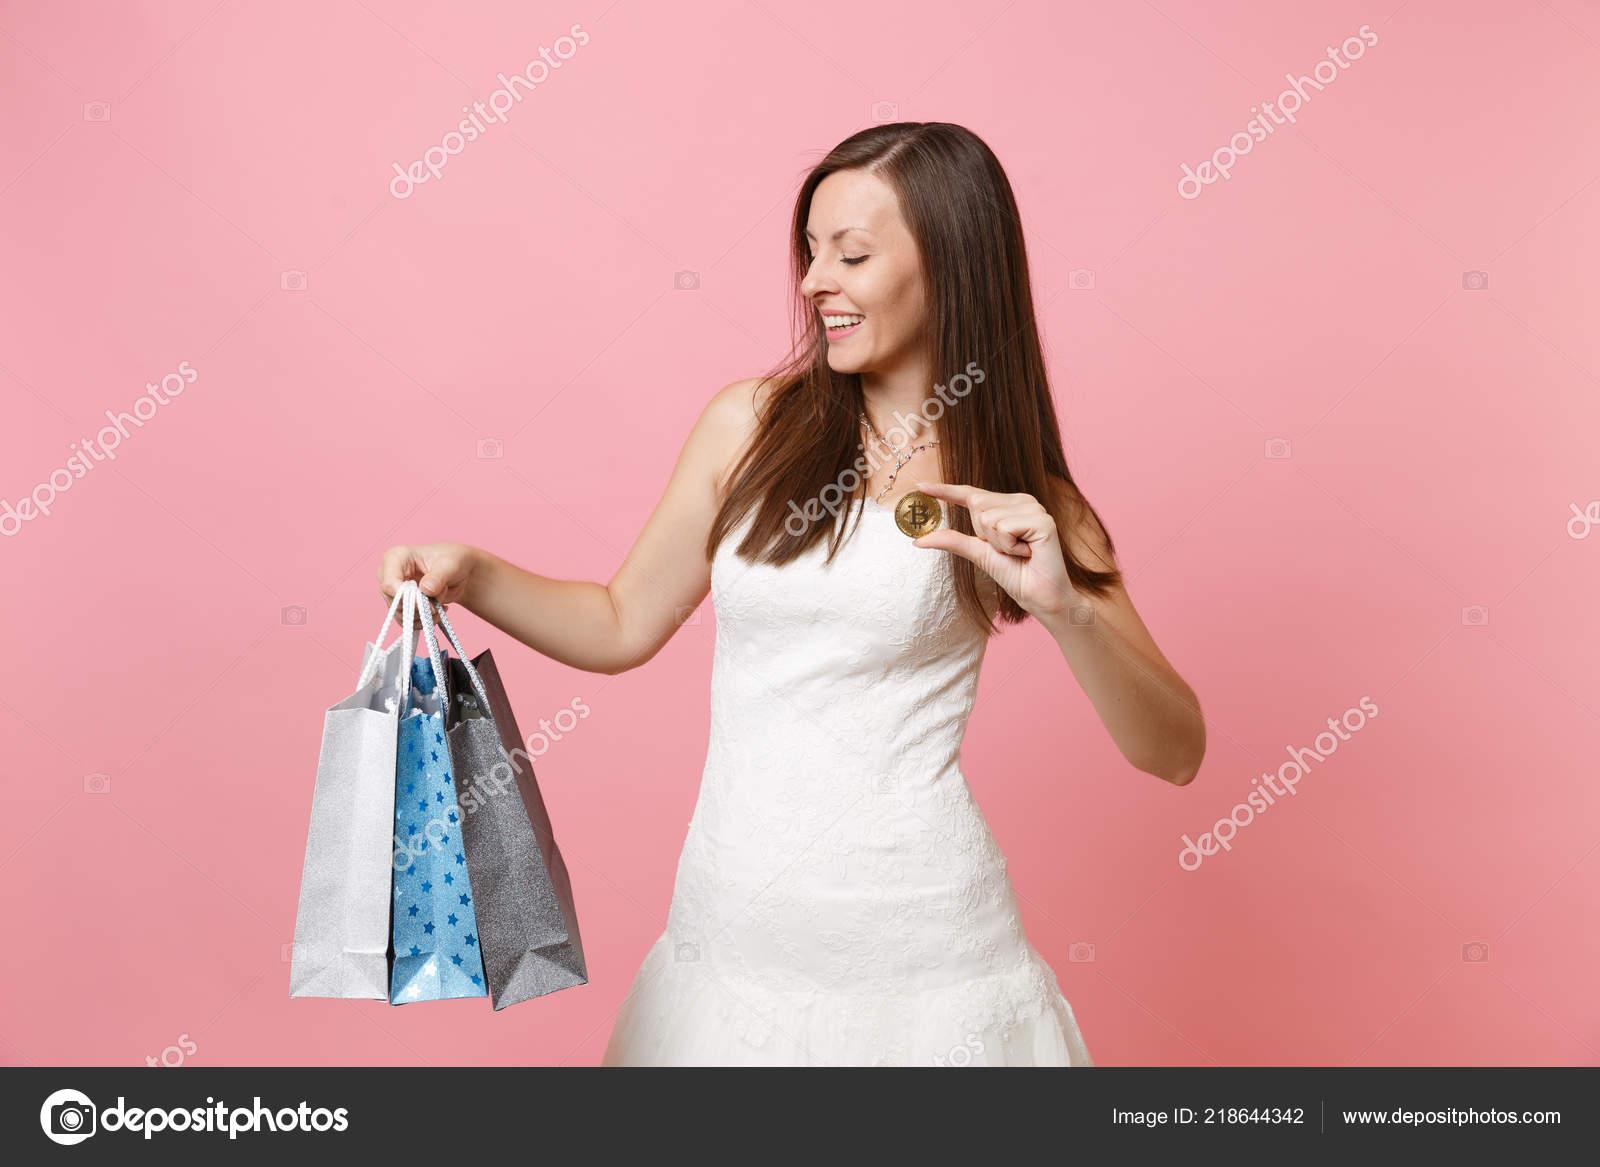 1104328b82 Οργάνωση του γάμου– Εκδοτικές Φωτογραφίες Αρχείου. Γυναίκα Όμορφη Νύφη Στο  Νυφικό ...